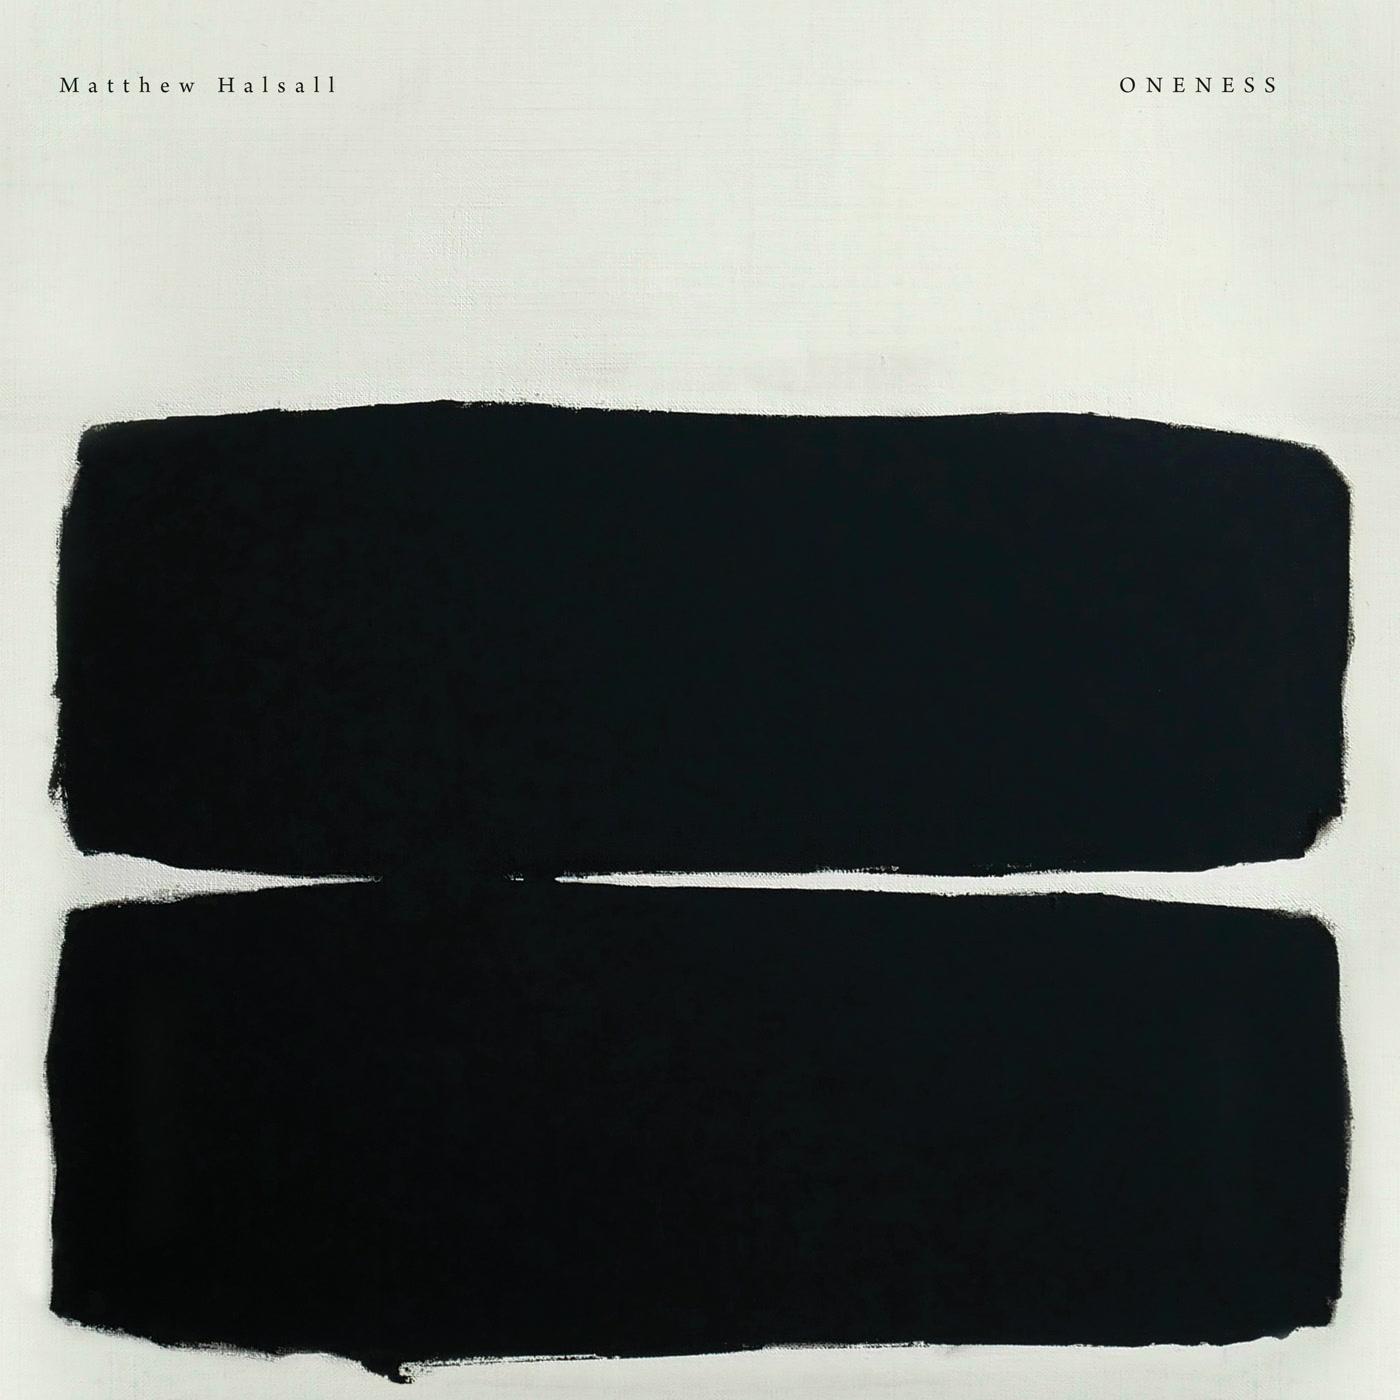 Matthew Halsall – Oneness (Gondwana Records)